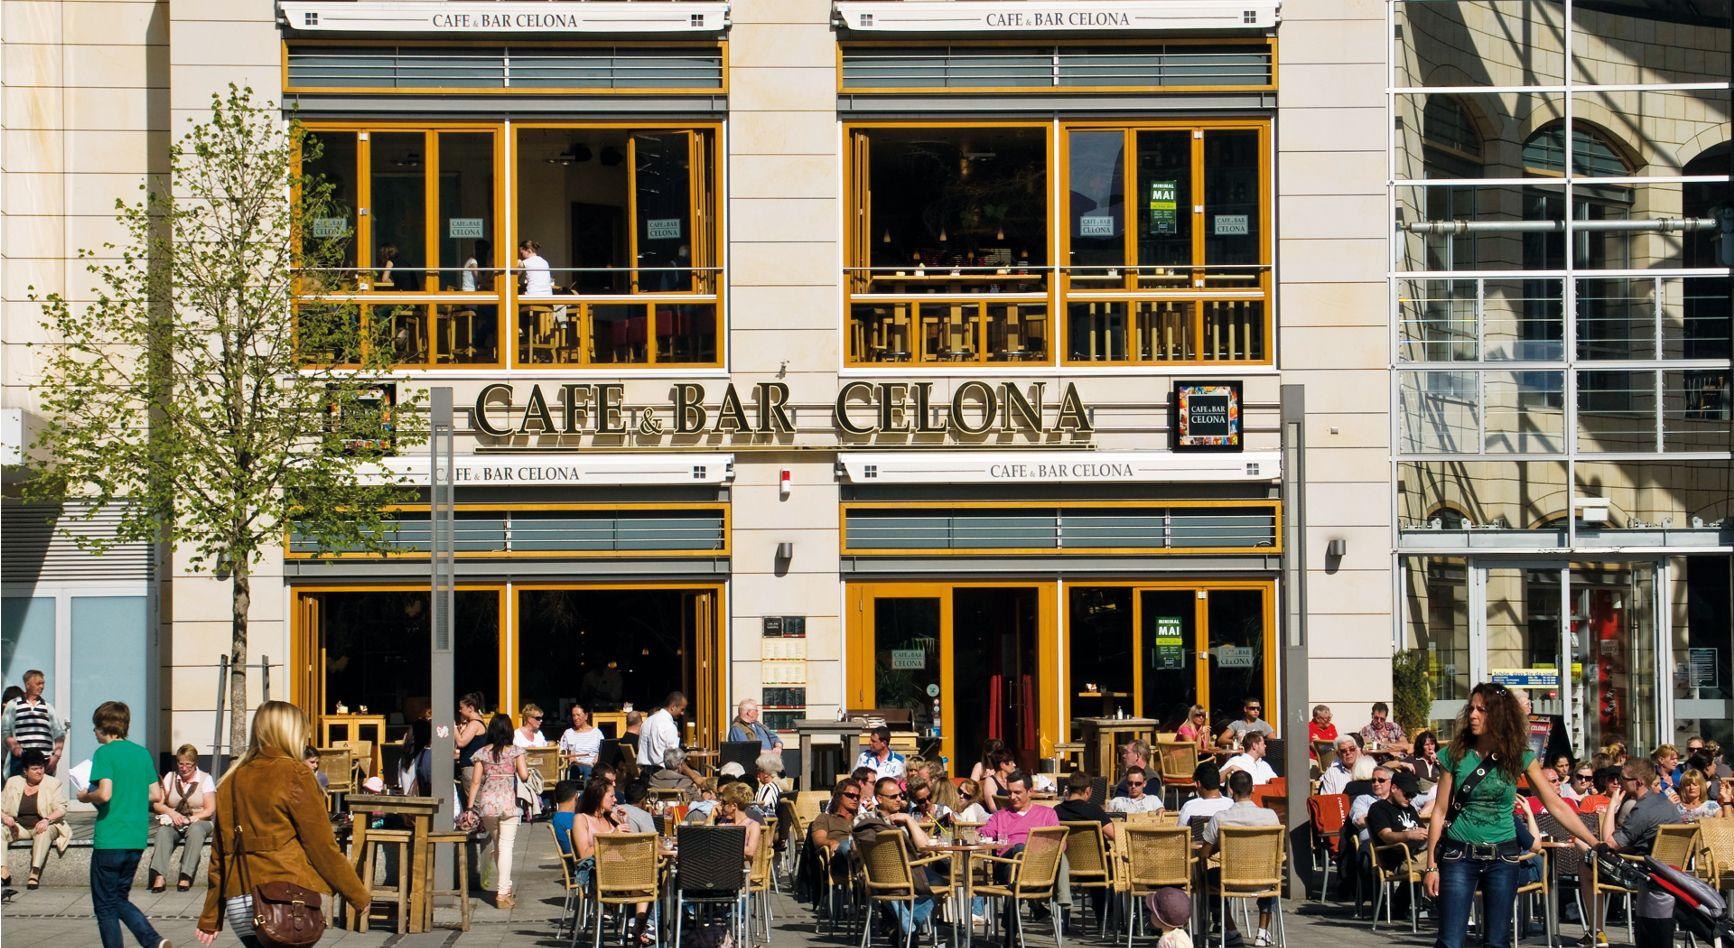 Cafe Bar Celona Bremen